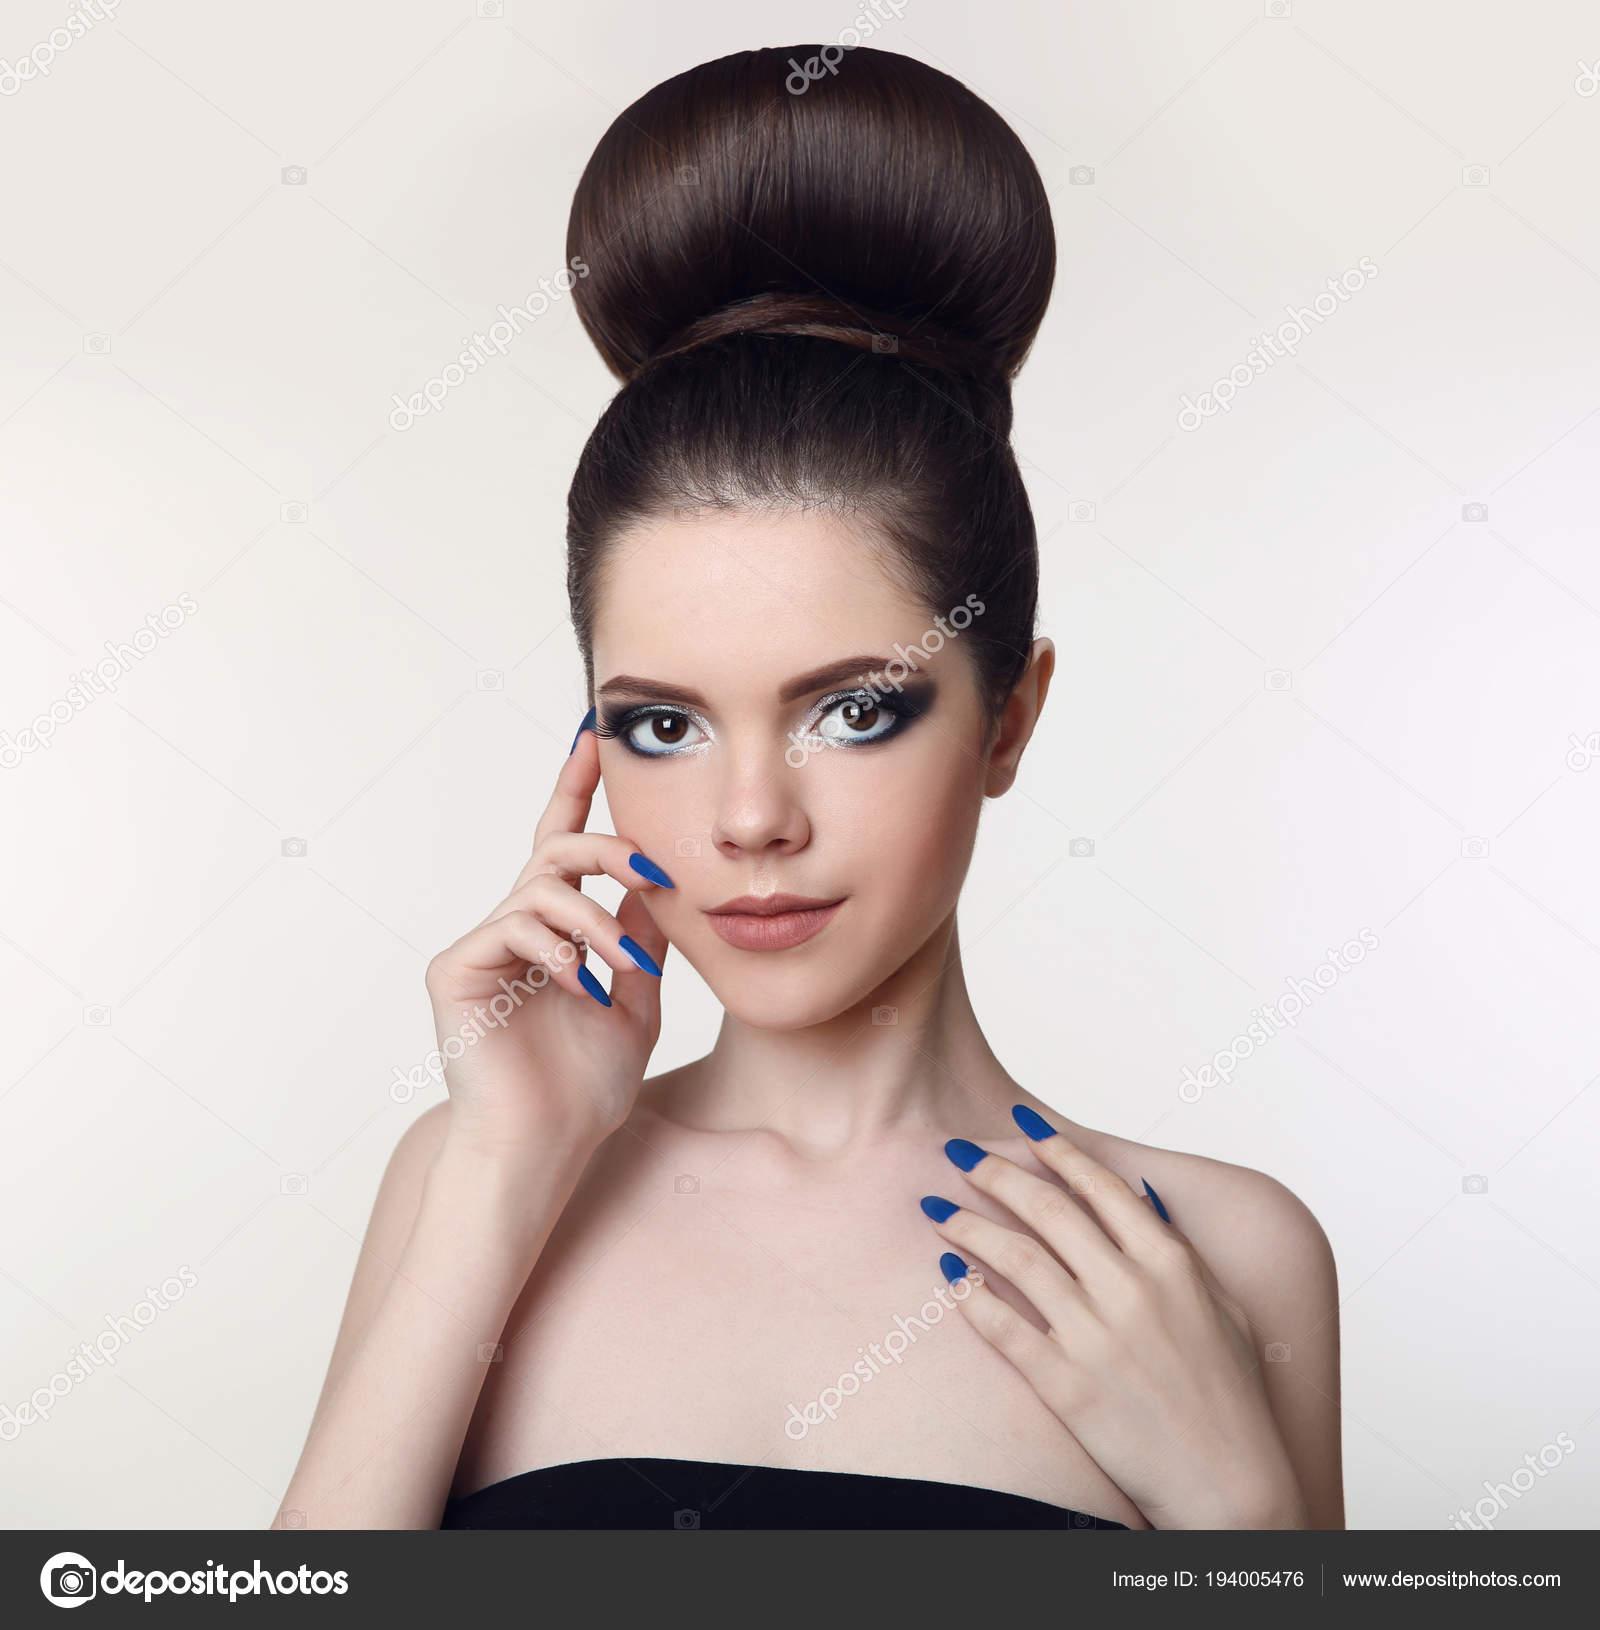 Güzellik Makyaj Kız Topuz Saç Modeli Mat Ruj Manikür Nai Stok